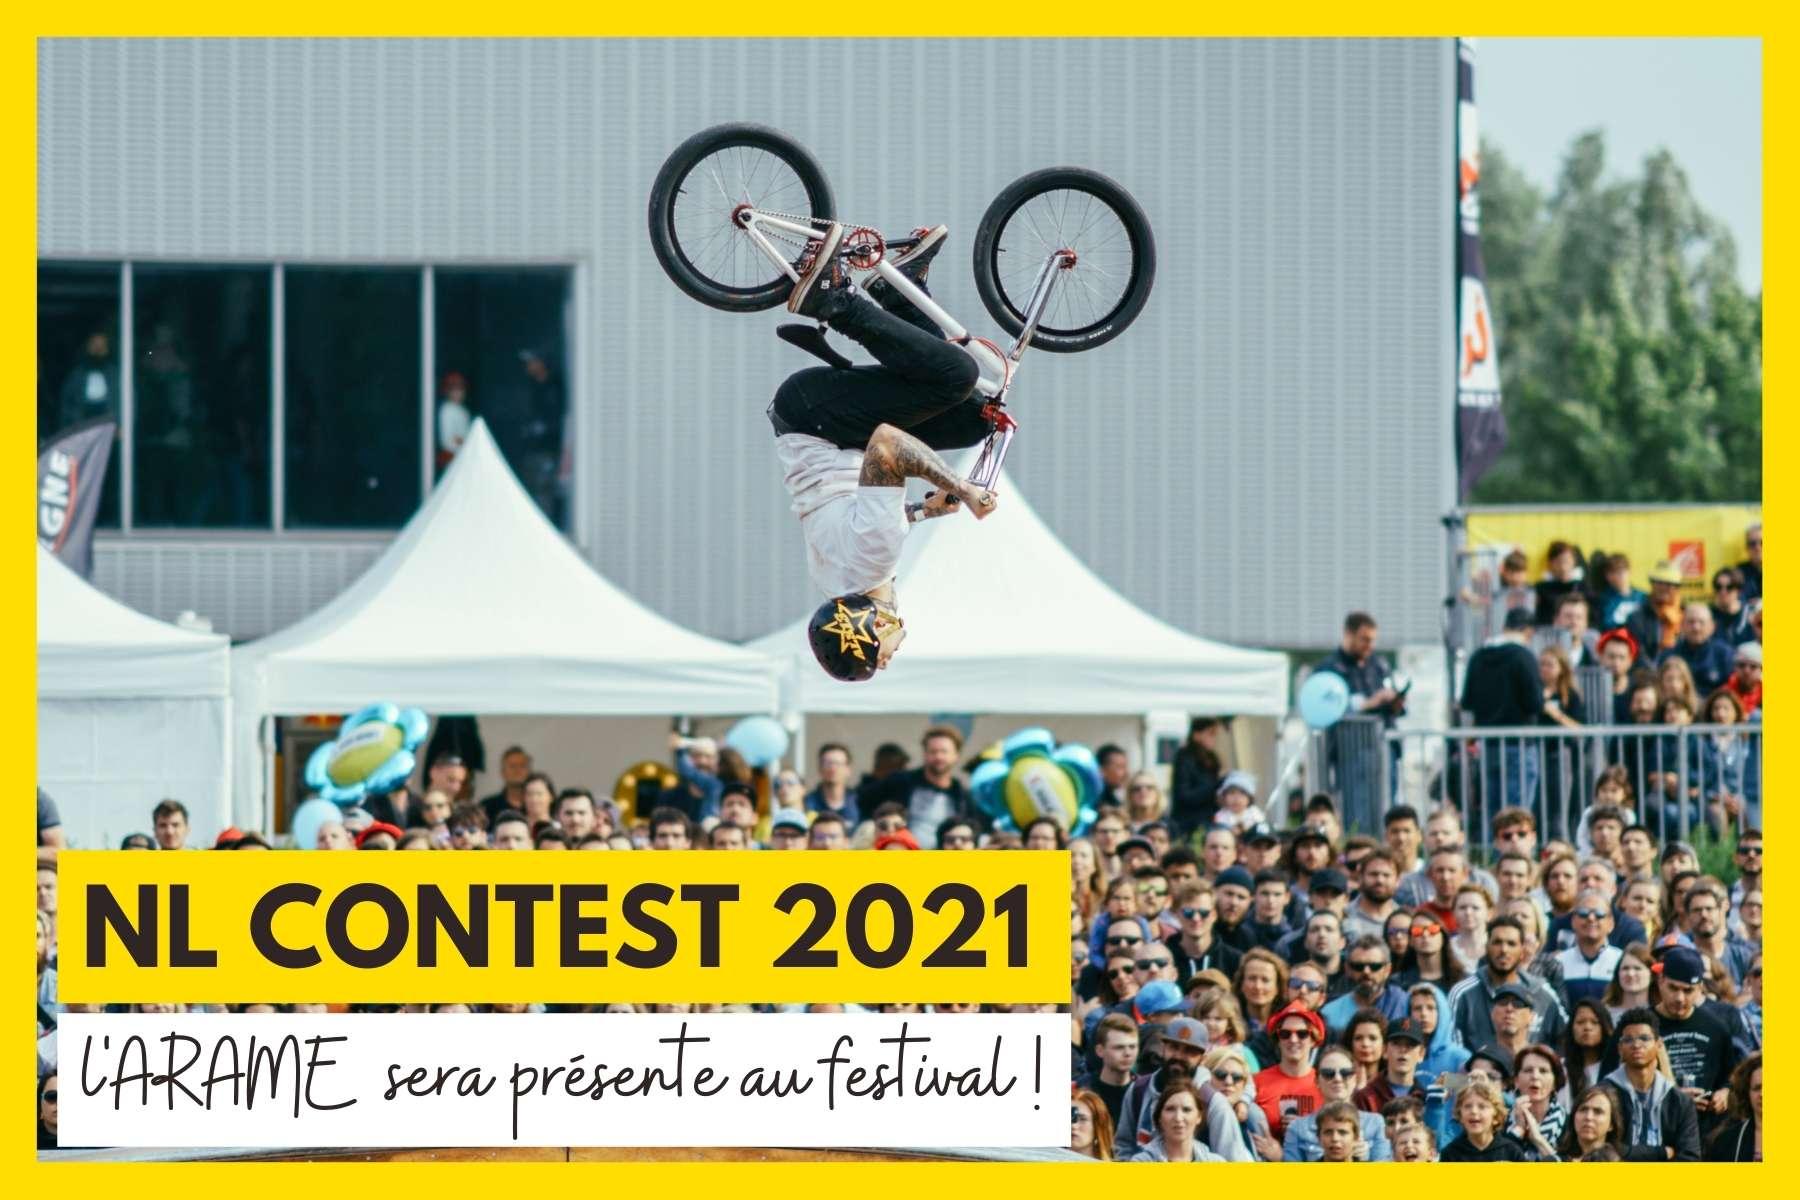 L'ARAME aura son stand au festival NL Contest 2021